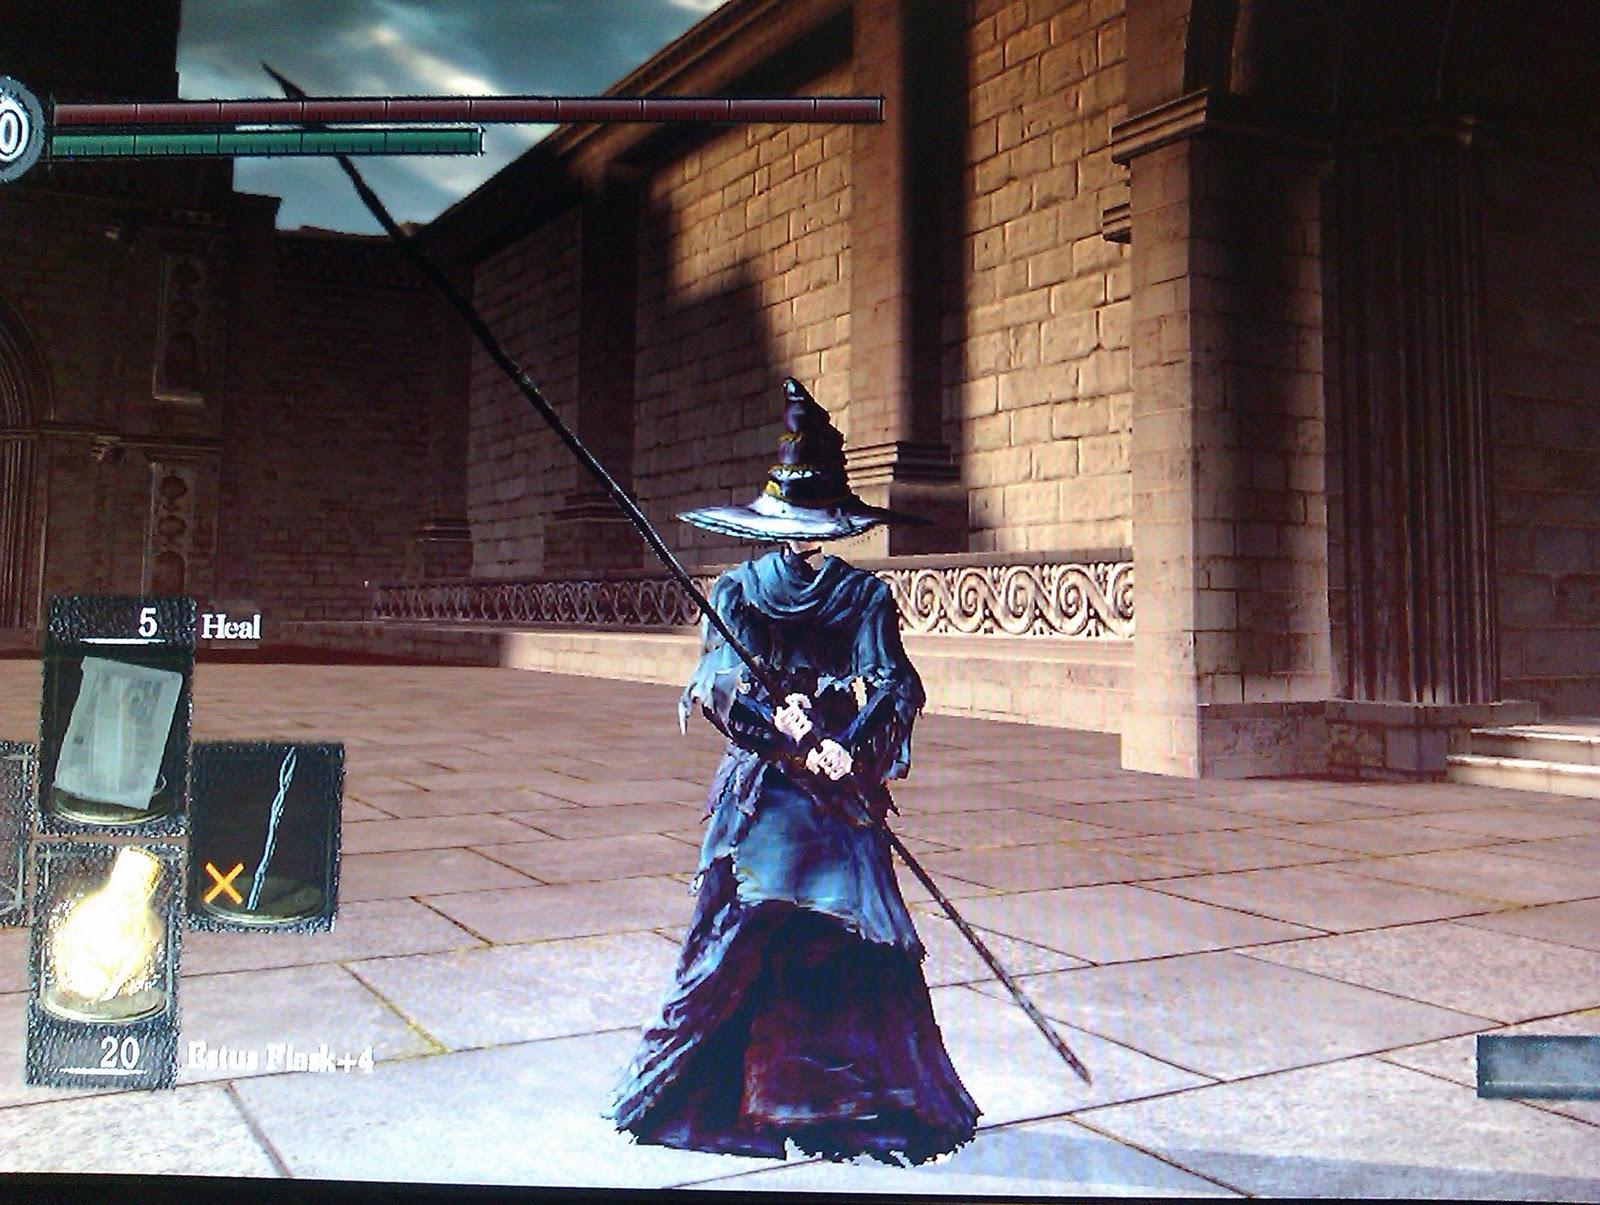 Chronicles Of A Lao Gamer: Interesting Dark Souls Build - photo#2